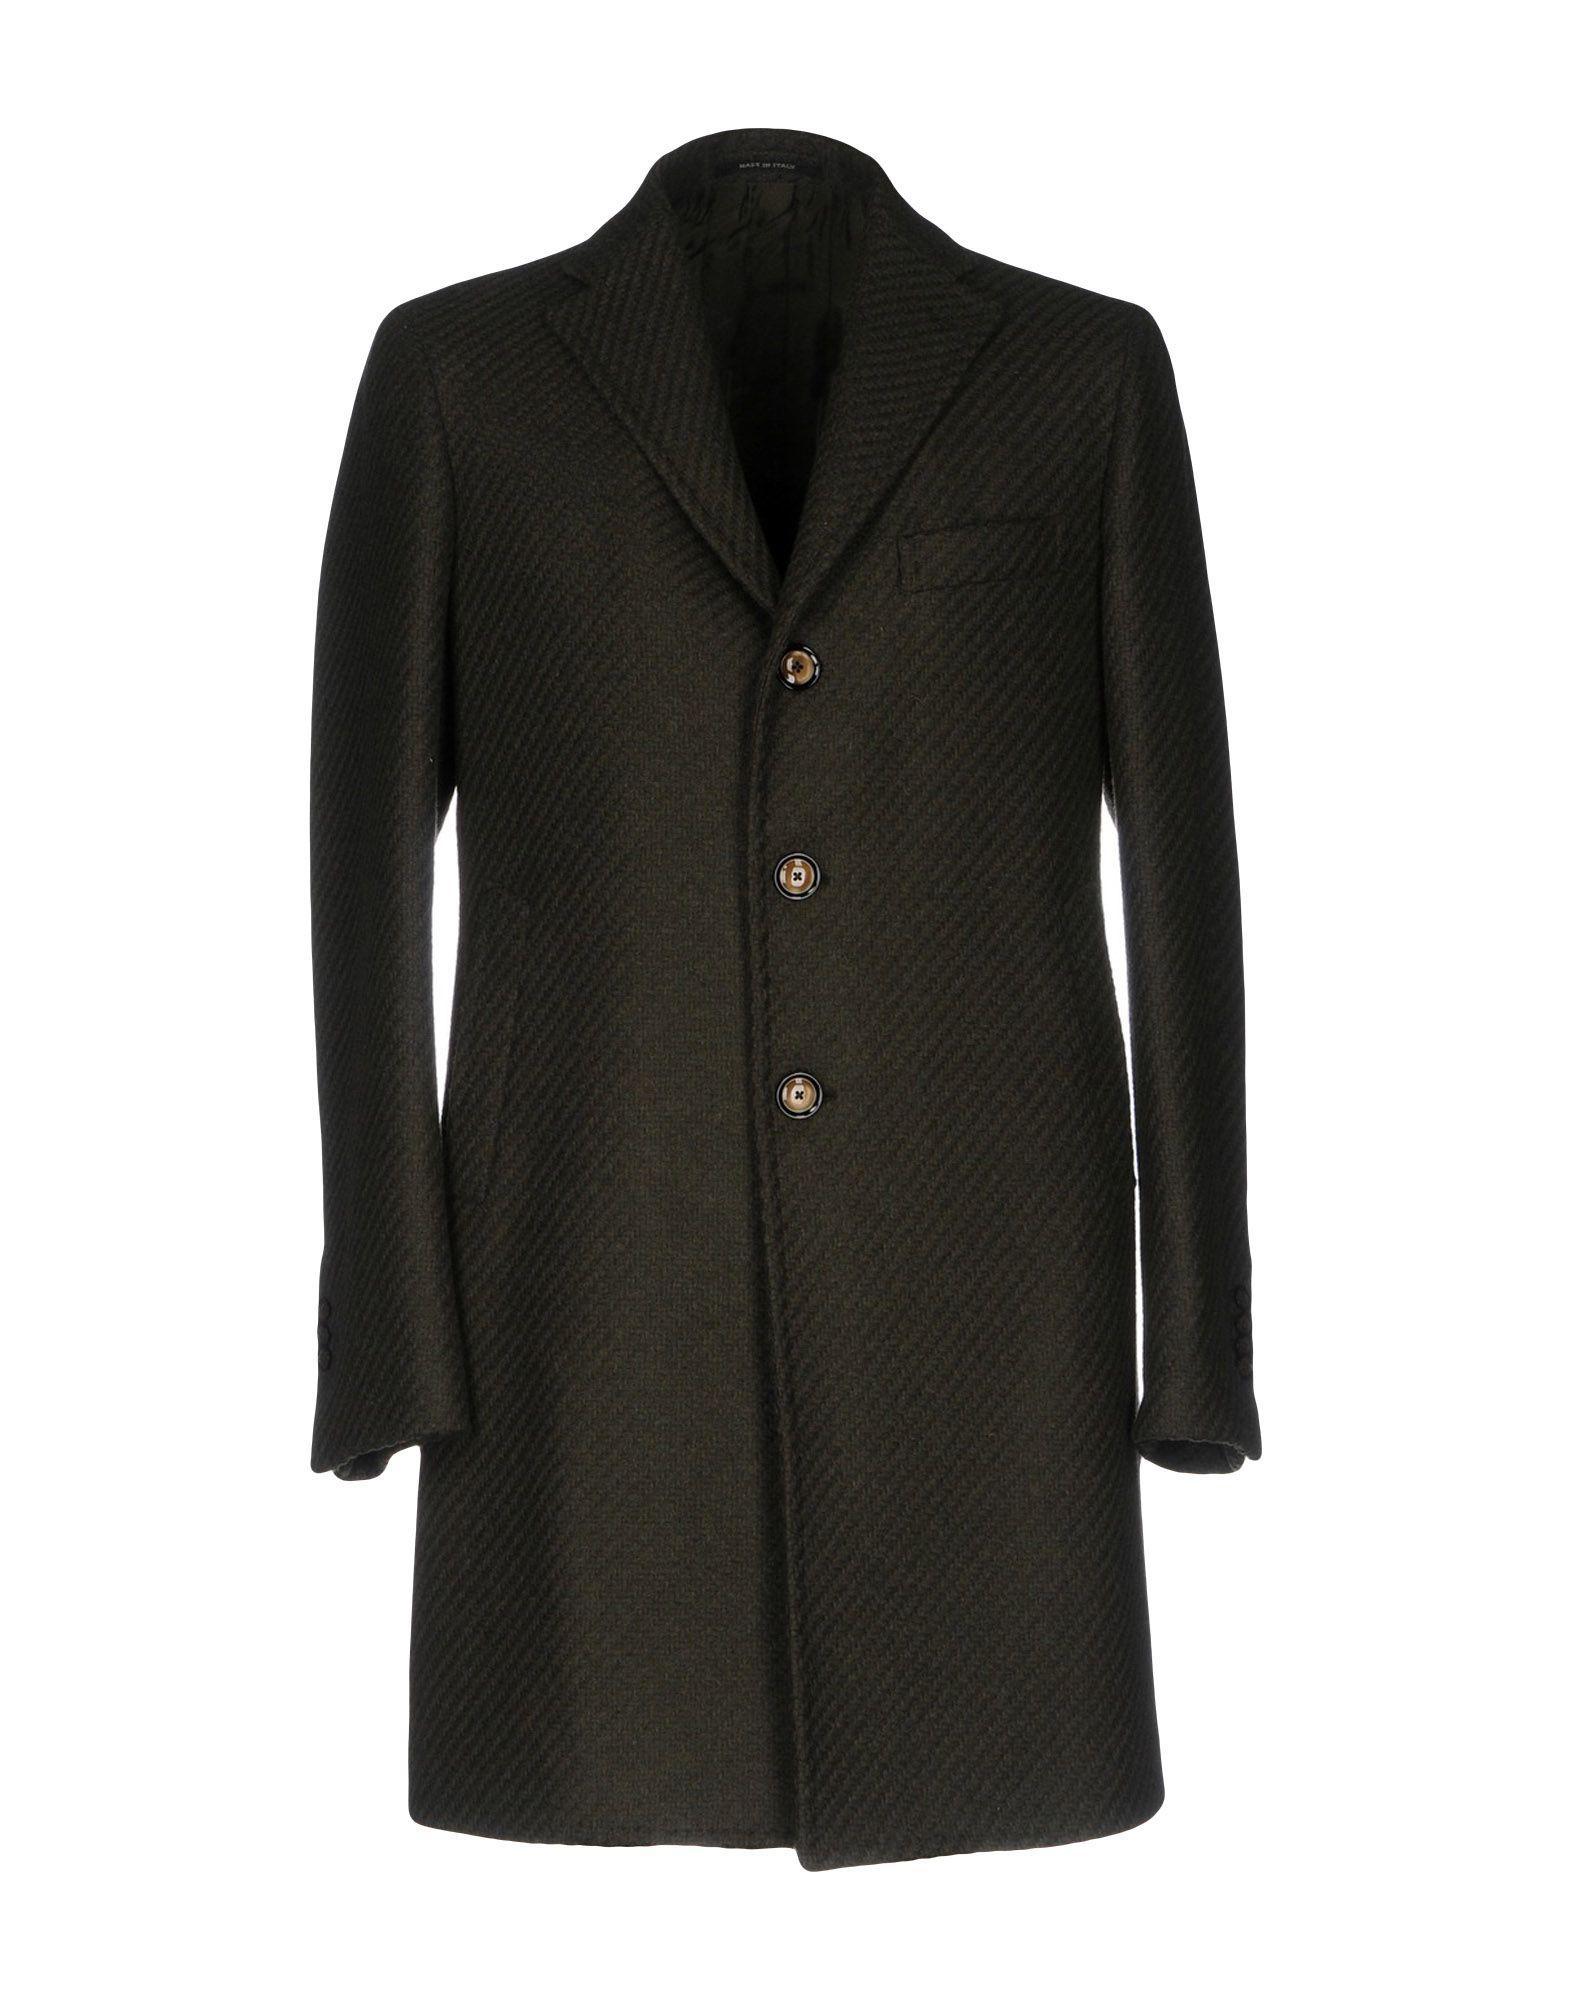 Tagliatore Coats In Military Green